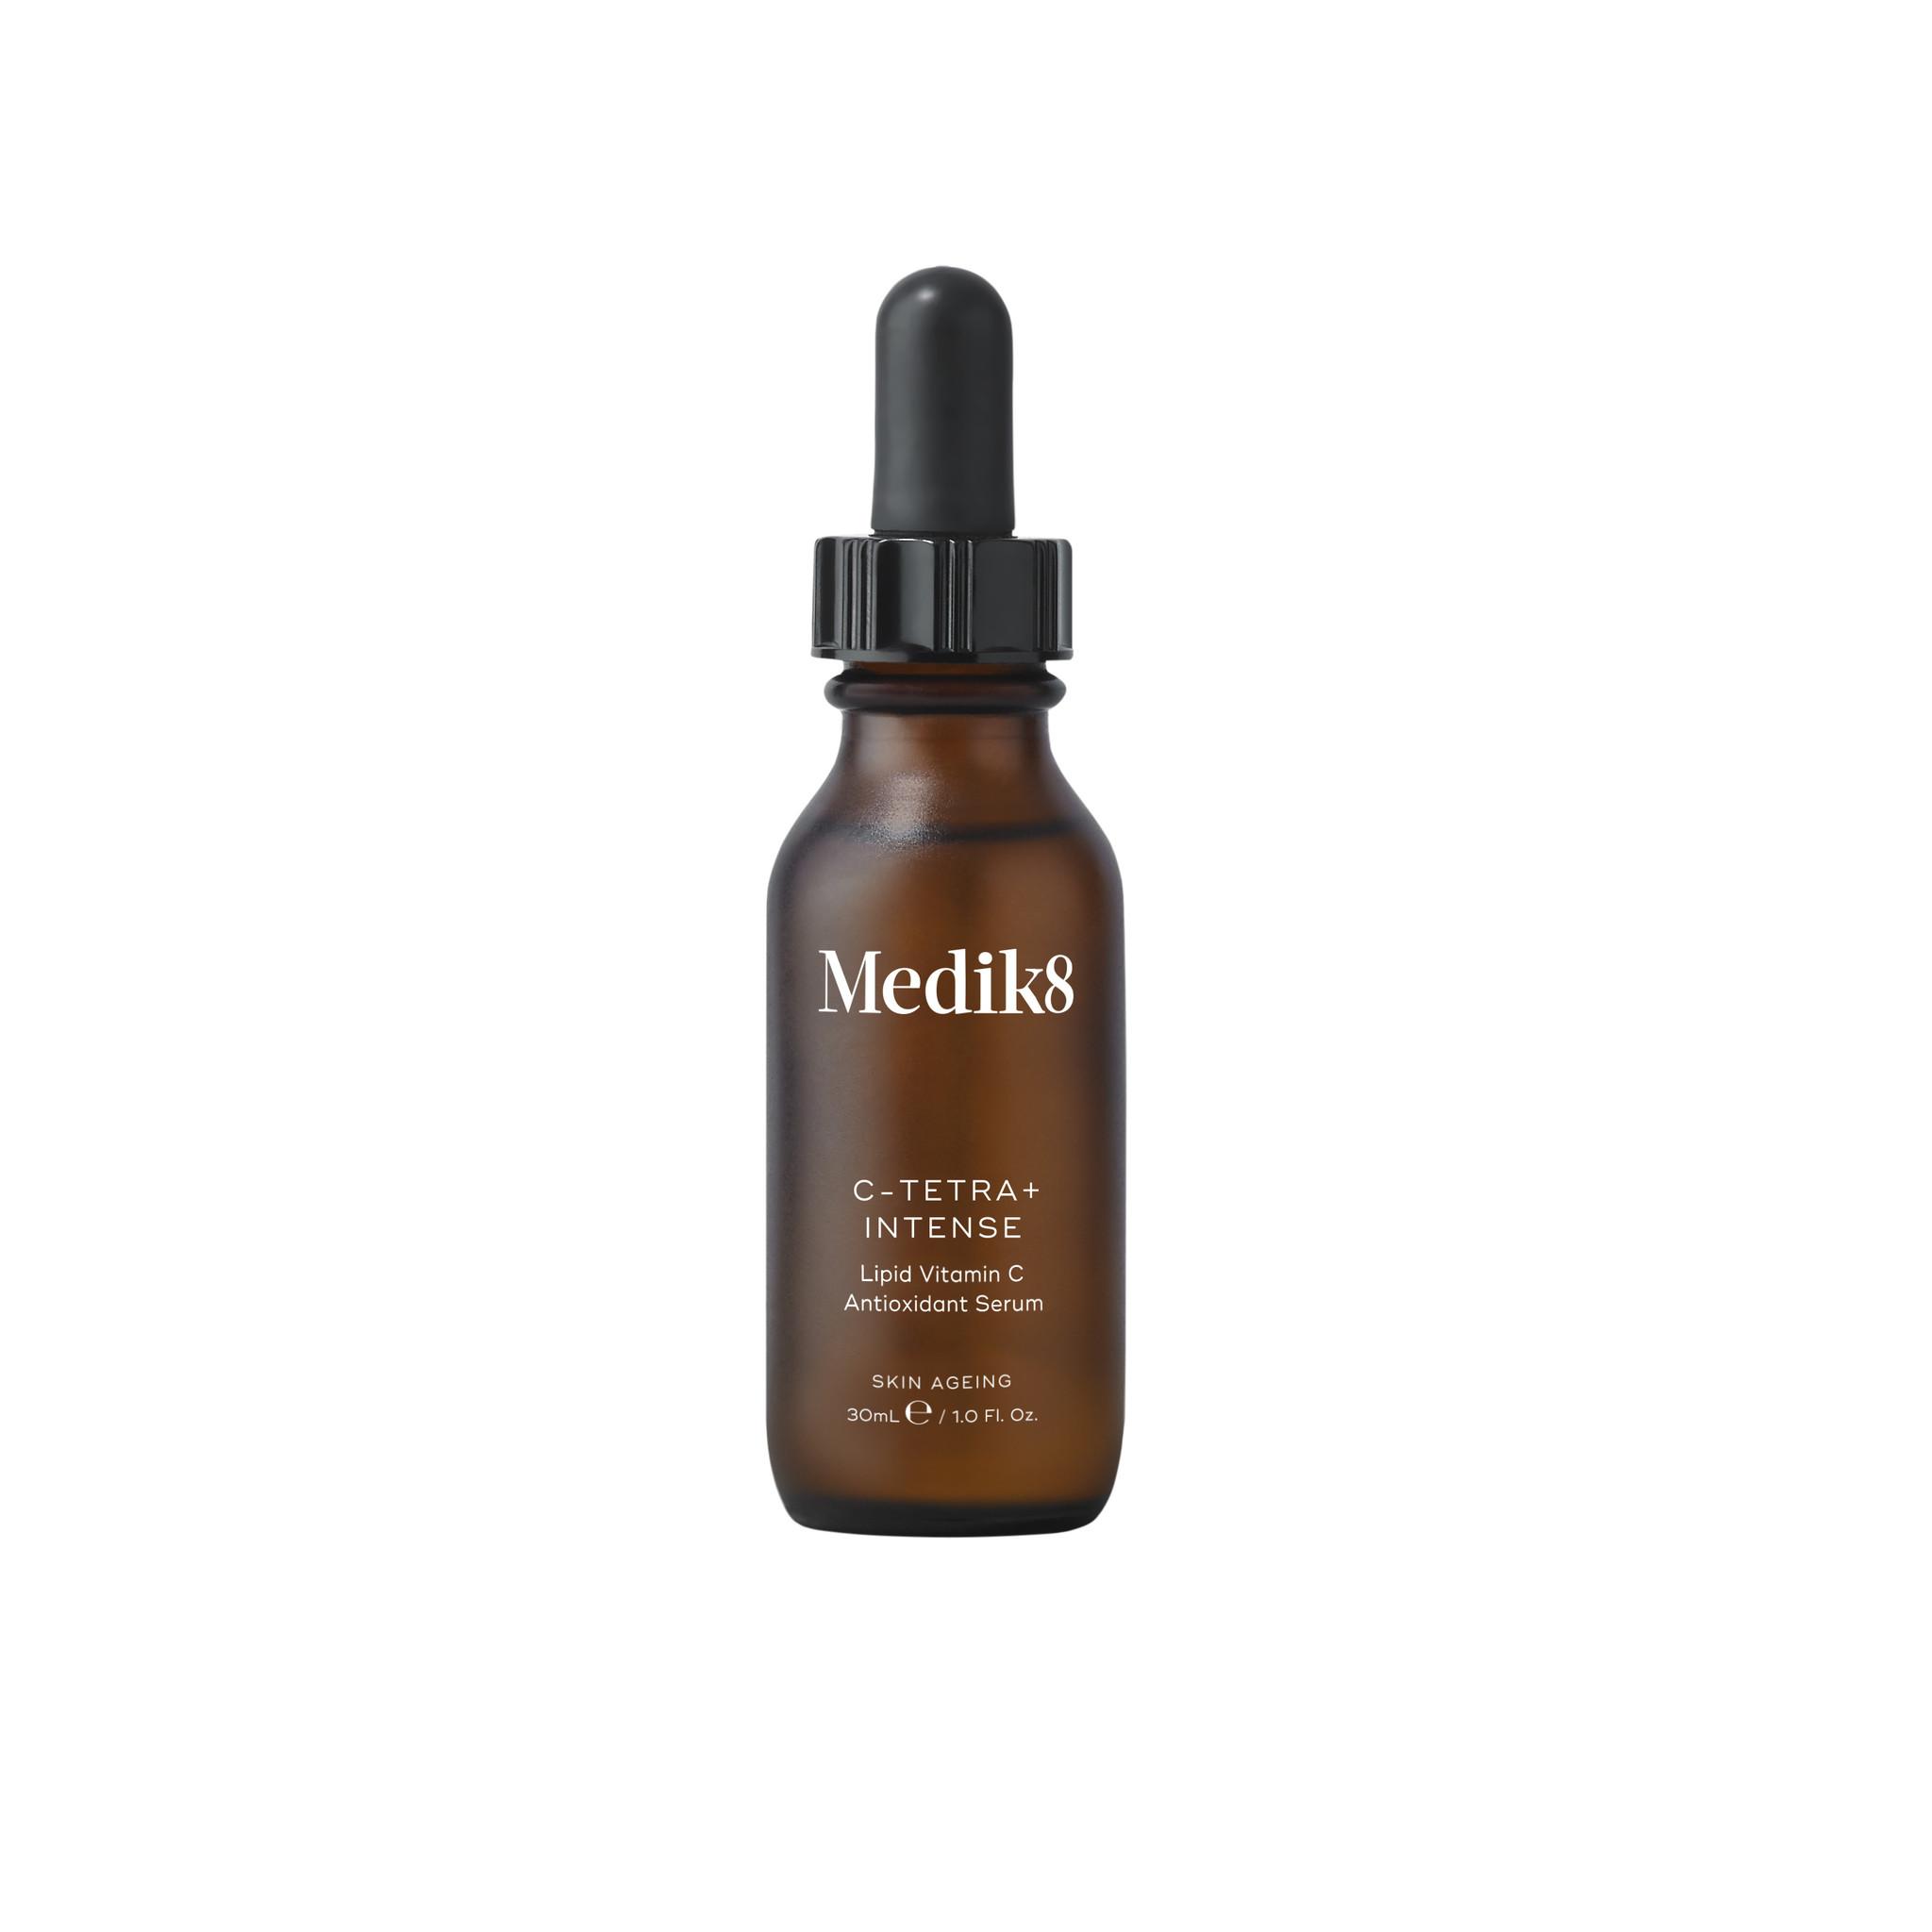 Medik8 Medik8 C-Tetra+ Intense serum 30ml